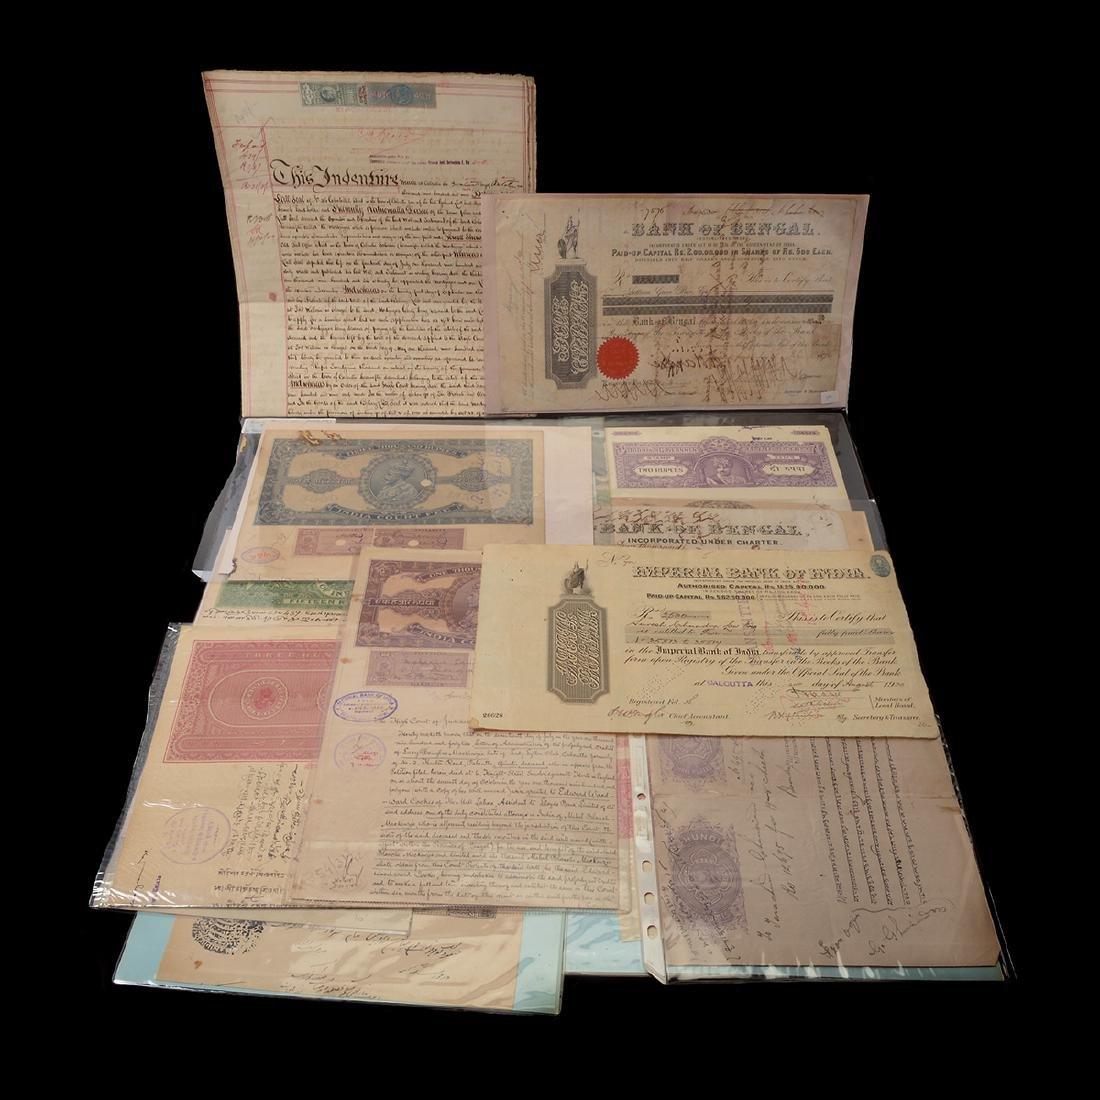 India Revenue Papers, 19th Century (26 Pieces)